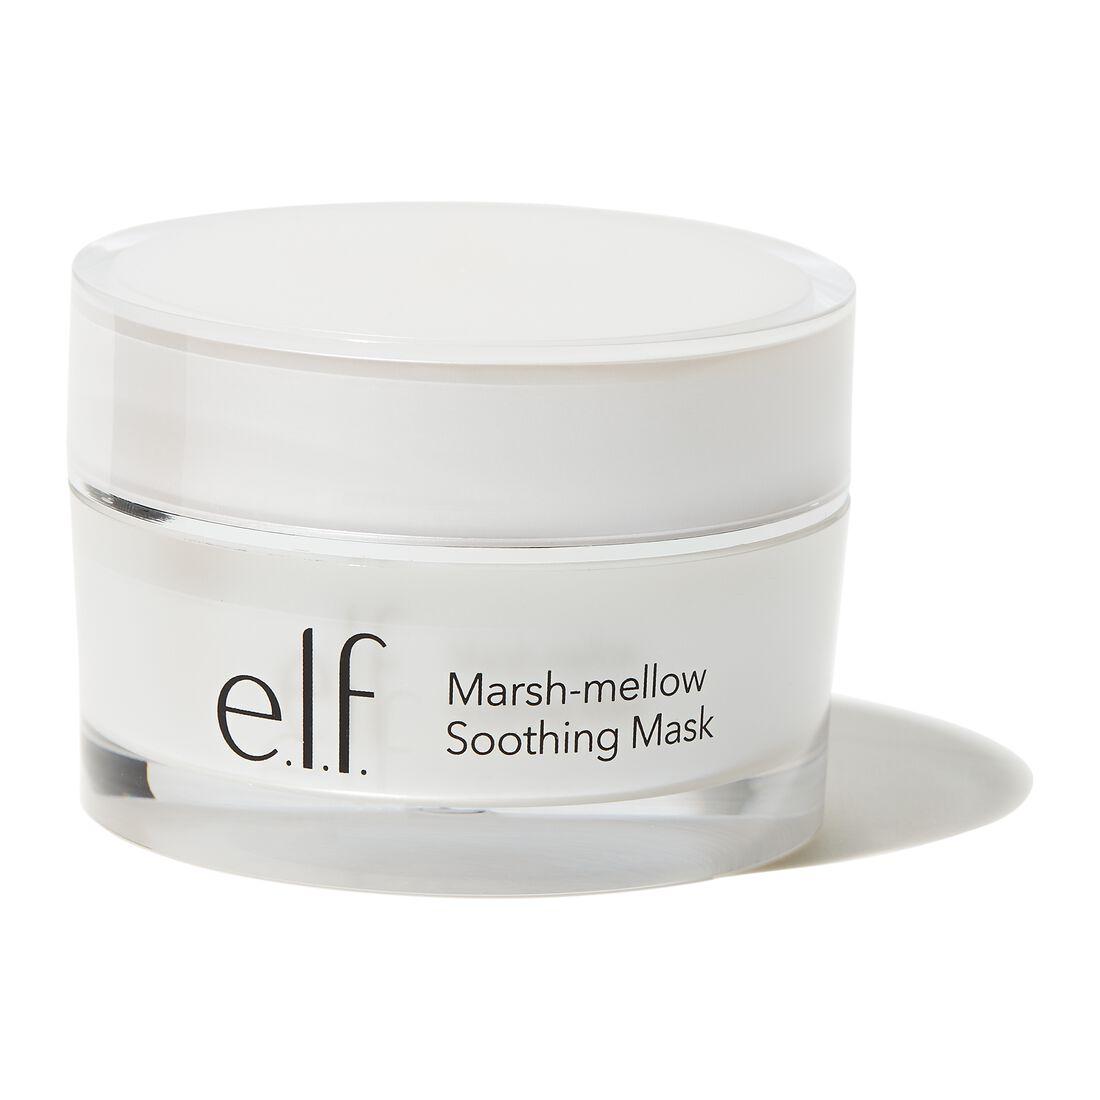 ELF Cosmetics - Marsh-mellow Soothing Mask